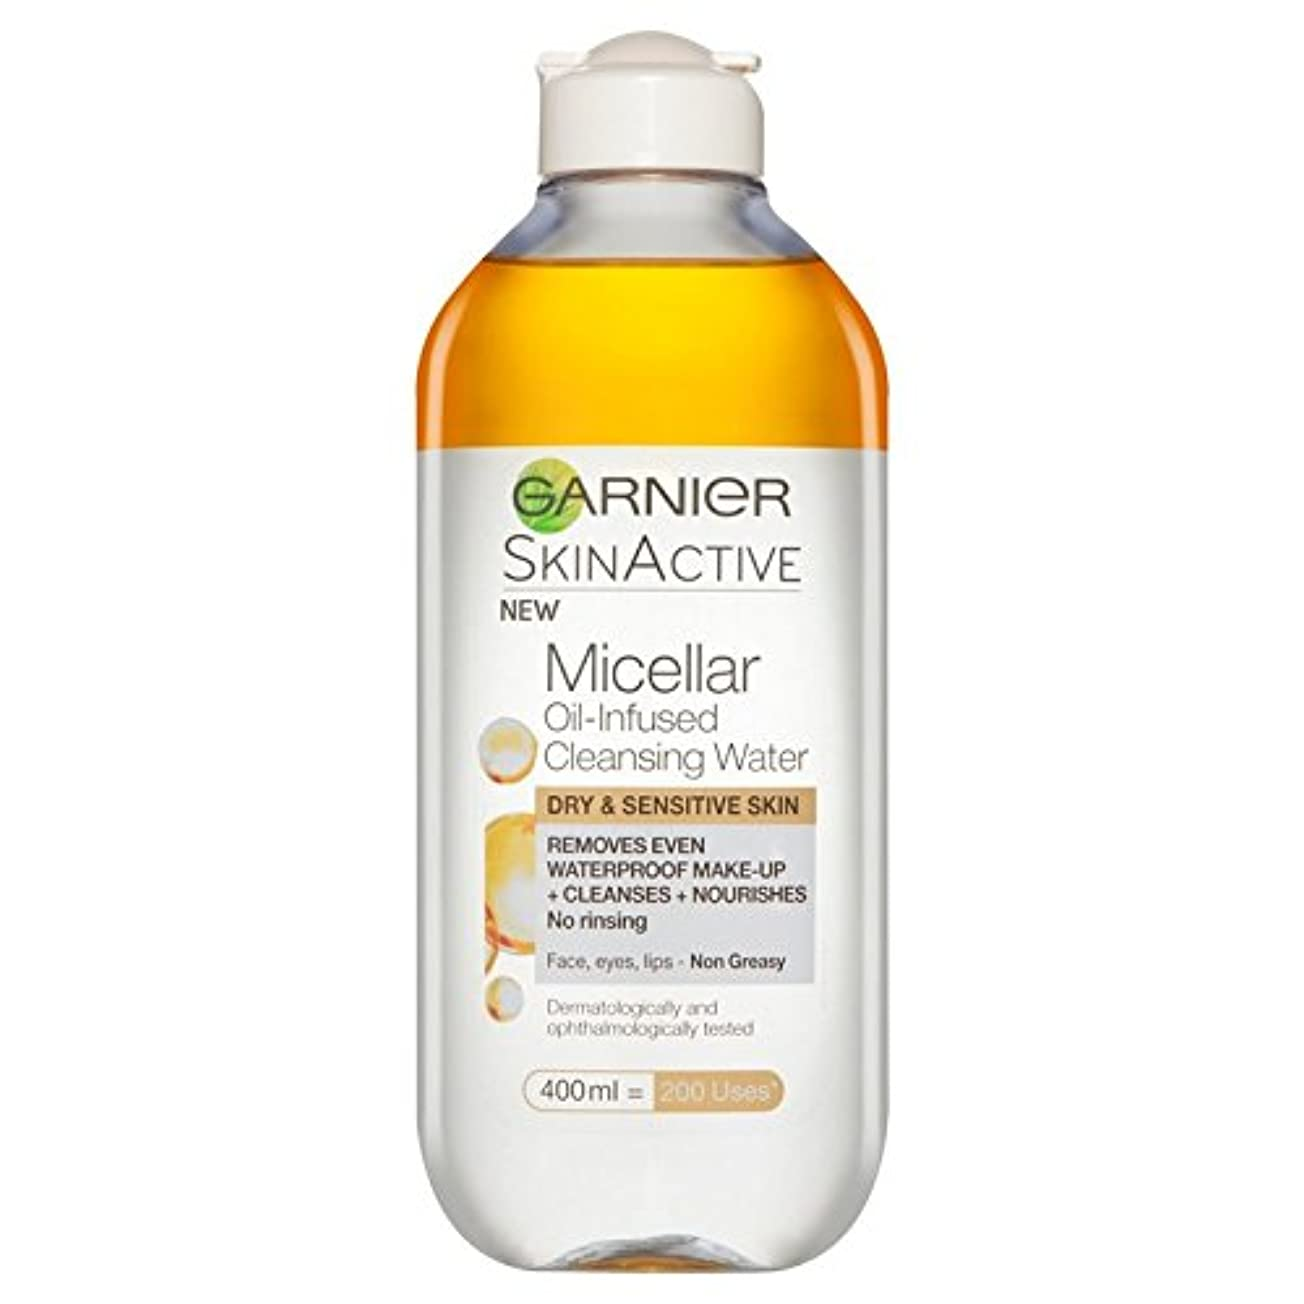 Garnier Skin Naturals Micellar Oil Infused Water - ガルニエ肌ナチュラルミセル油注入された水 [並行輸入品]